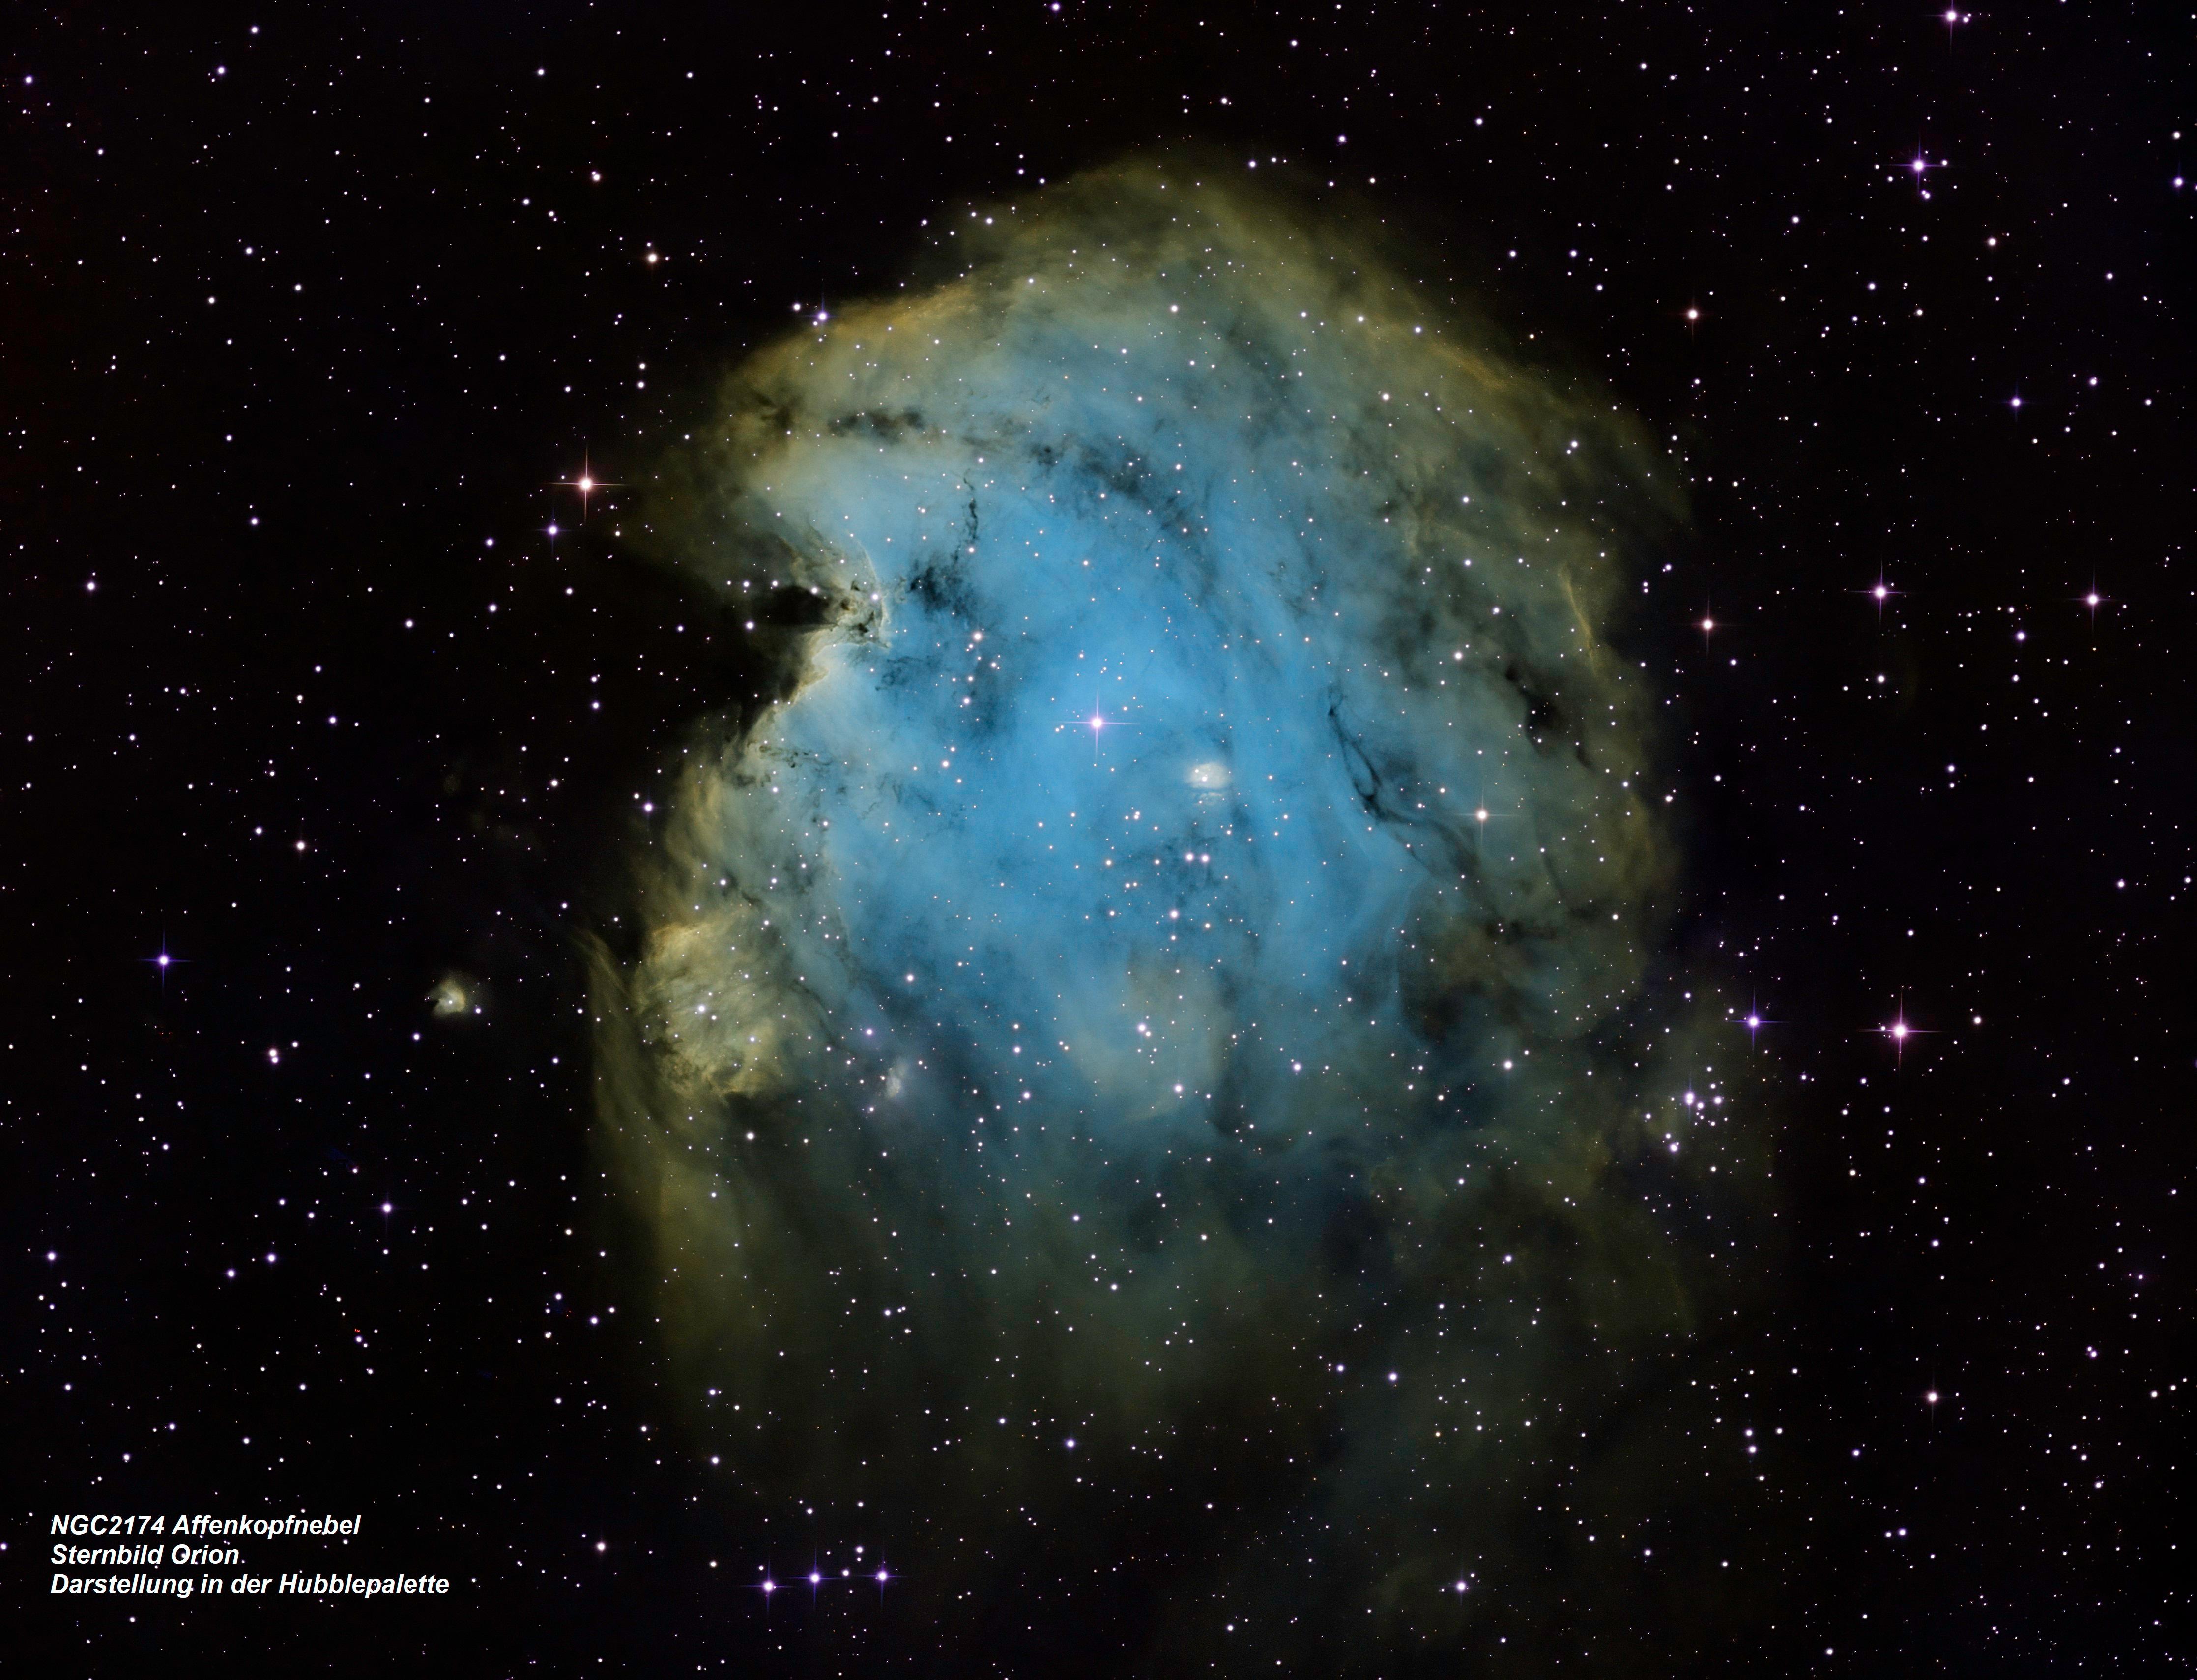 NGC 2174 Affenkopfnebel (Hubble-Farbpalette)